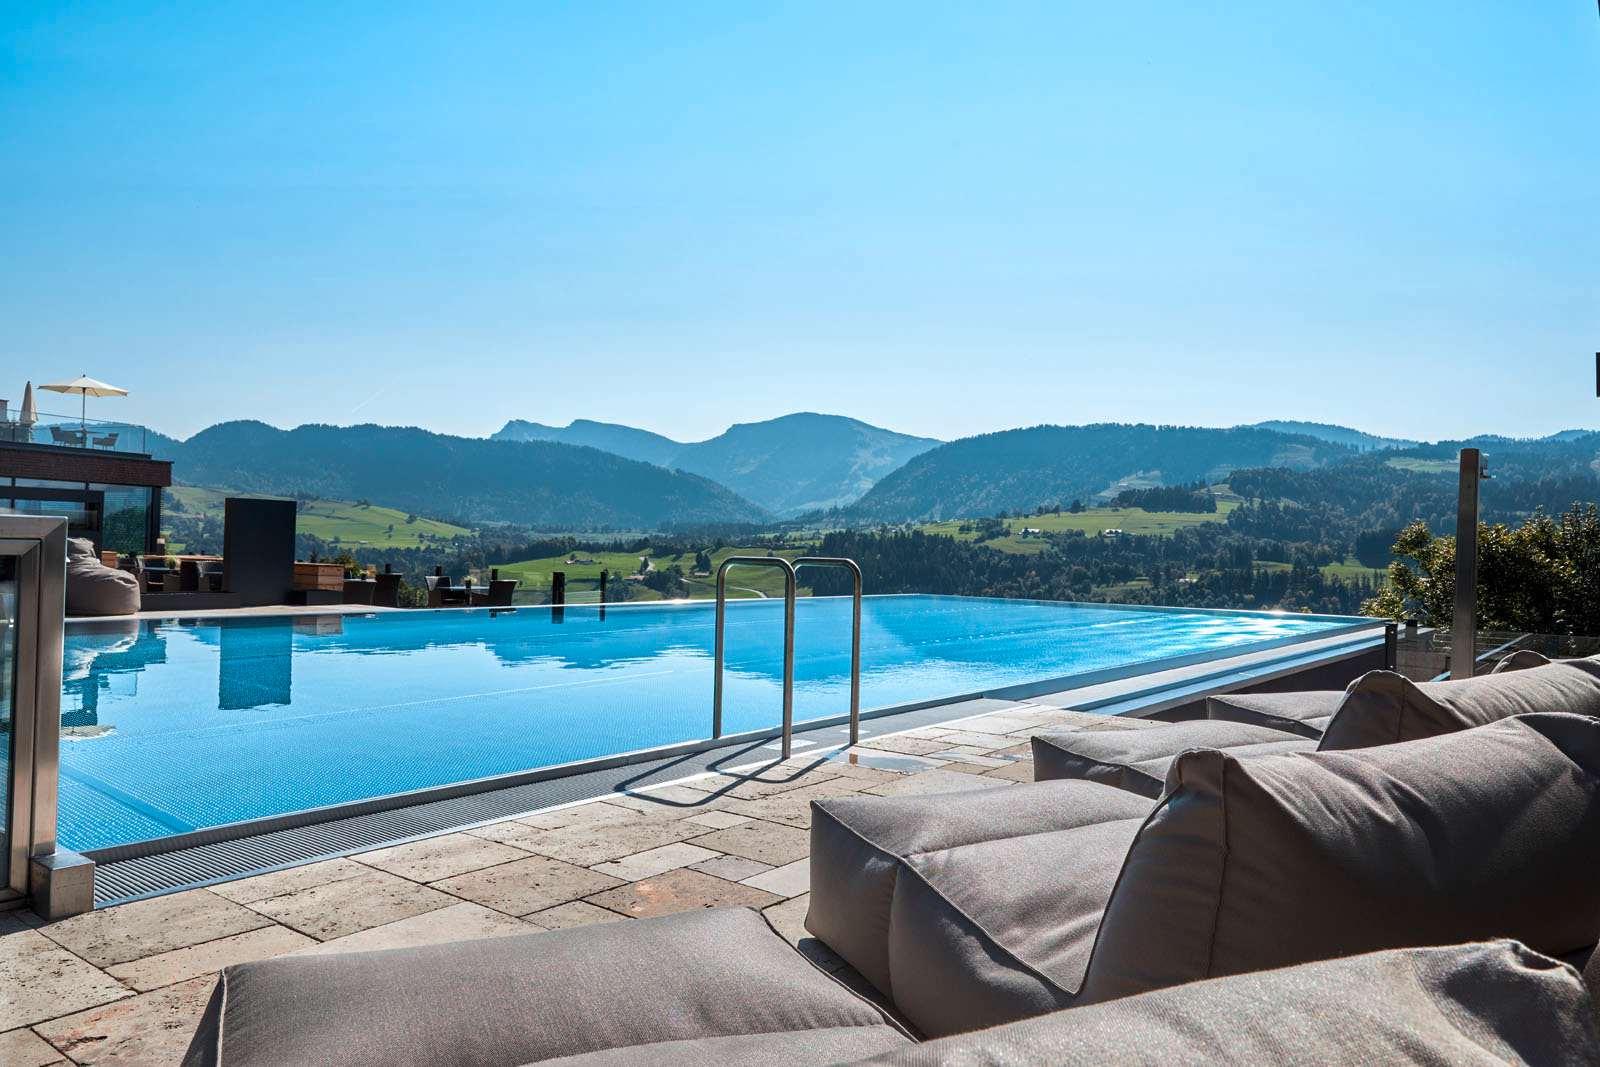 Infinity-Pool im Wellnesshotel Bergkristall mit Bergpanorama